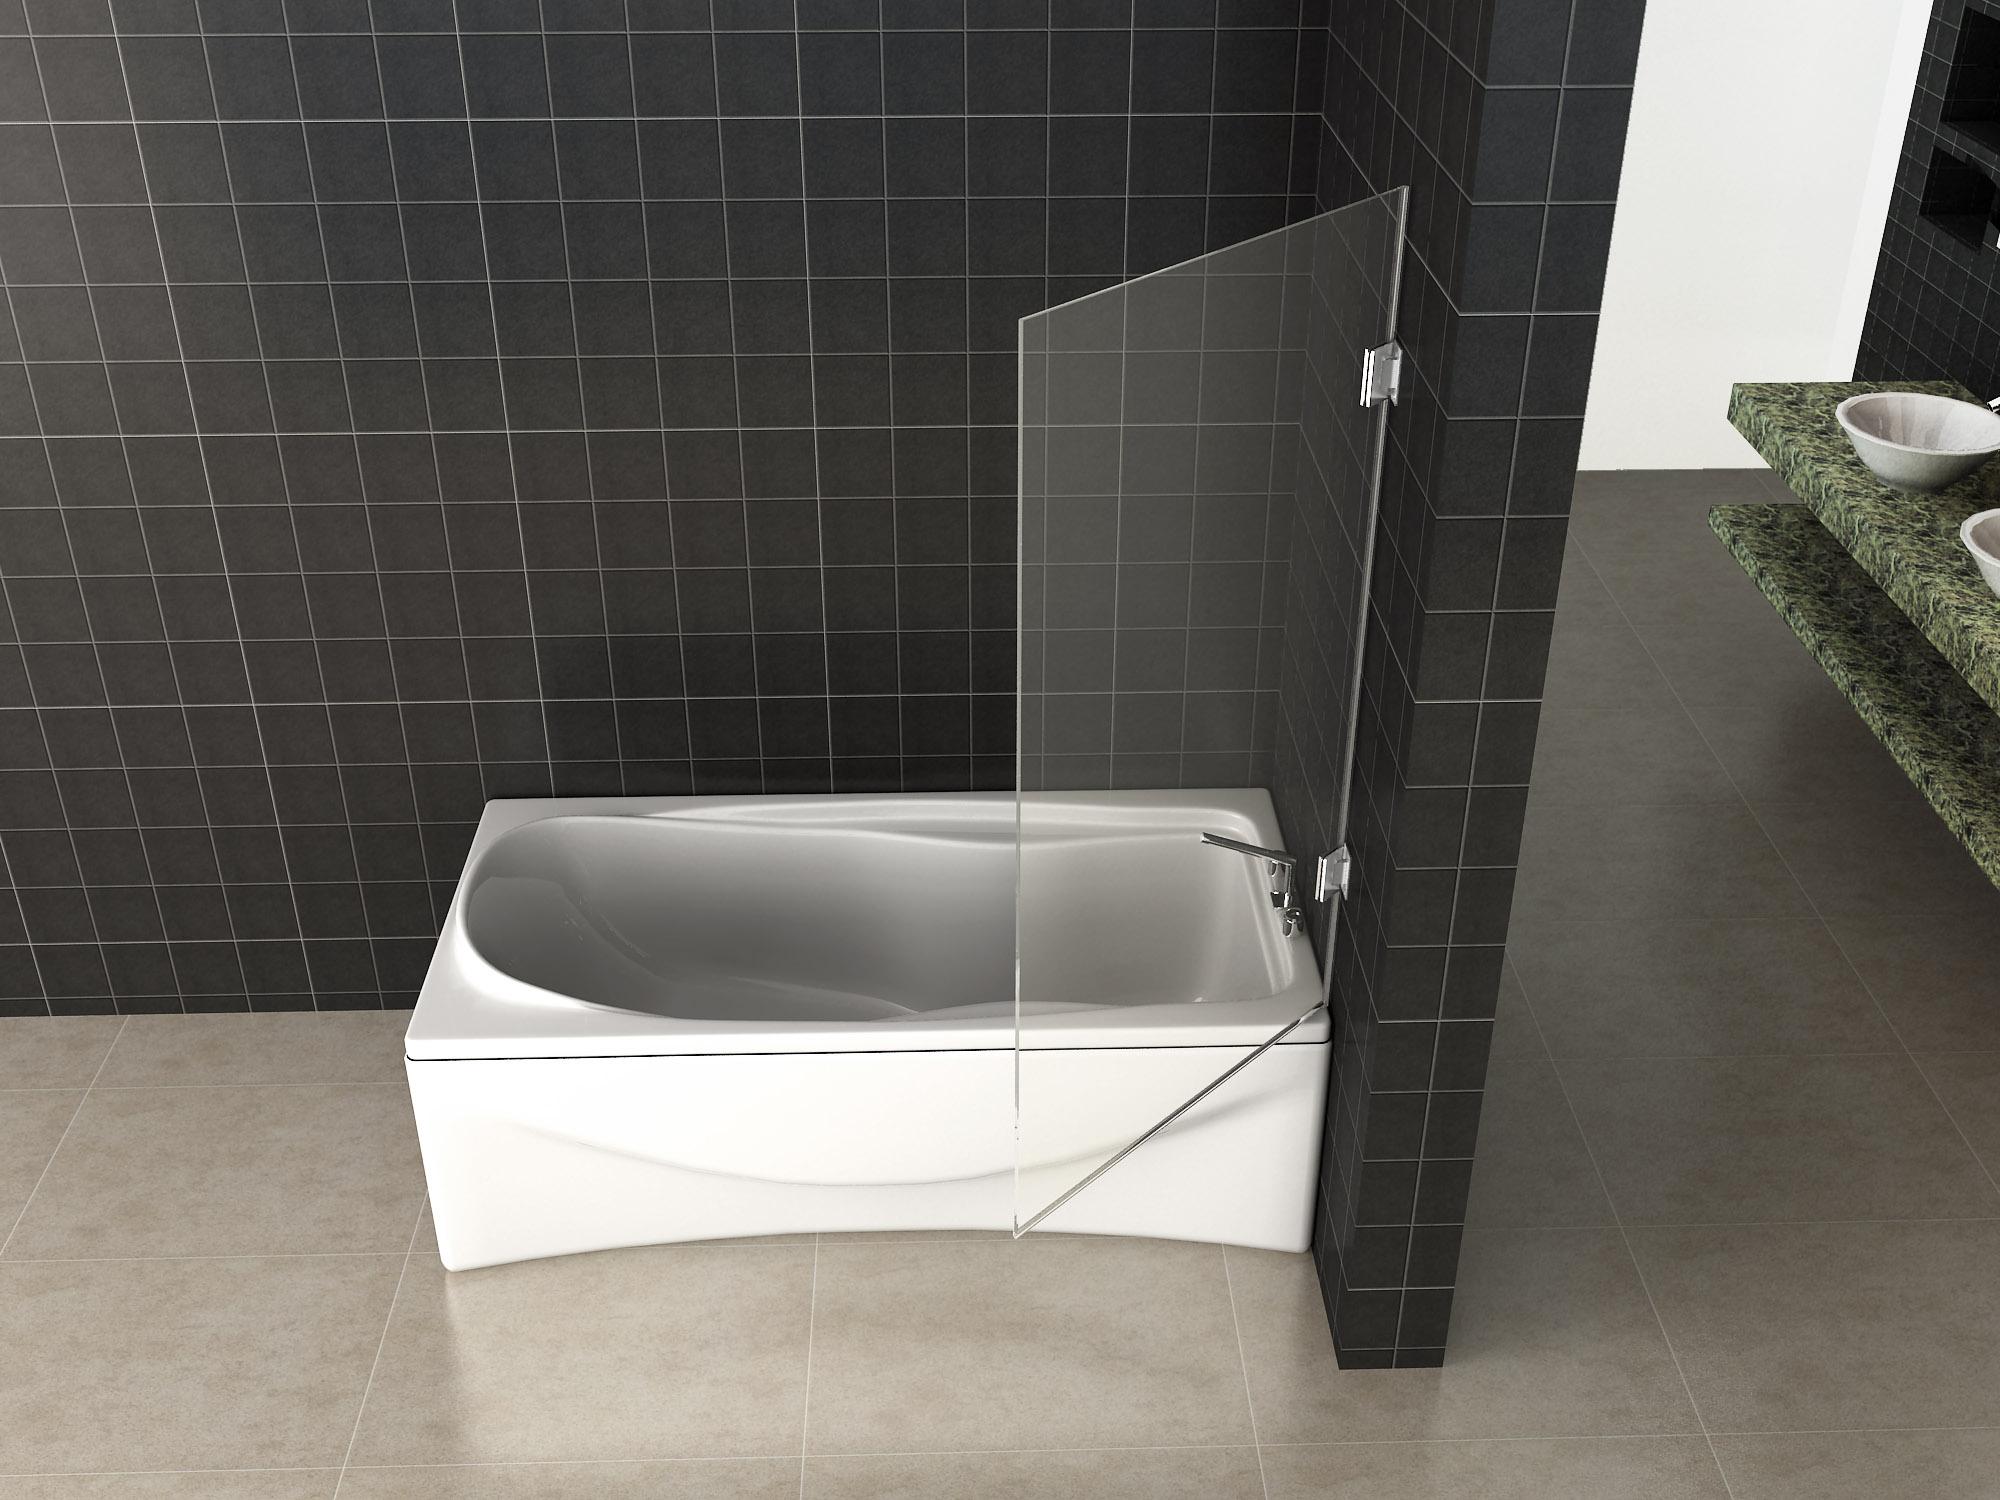 Wiesbaden Less profielloze scharnierende badwand 80 cm, 6 mm Nano-glas